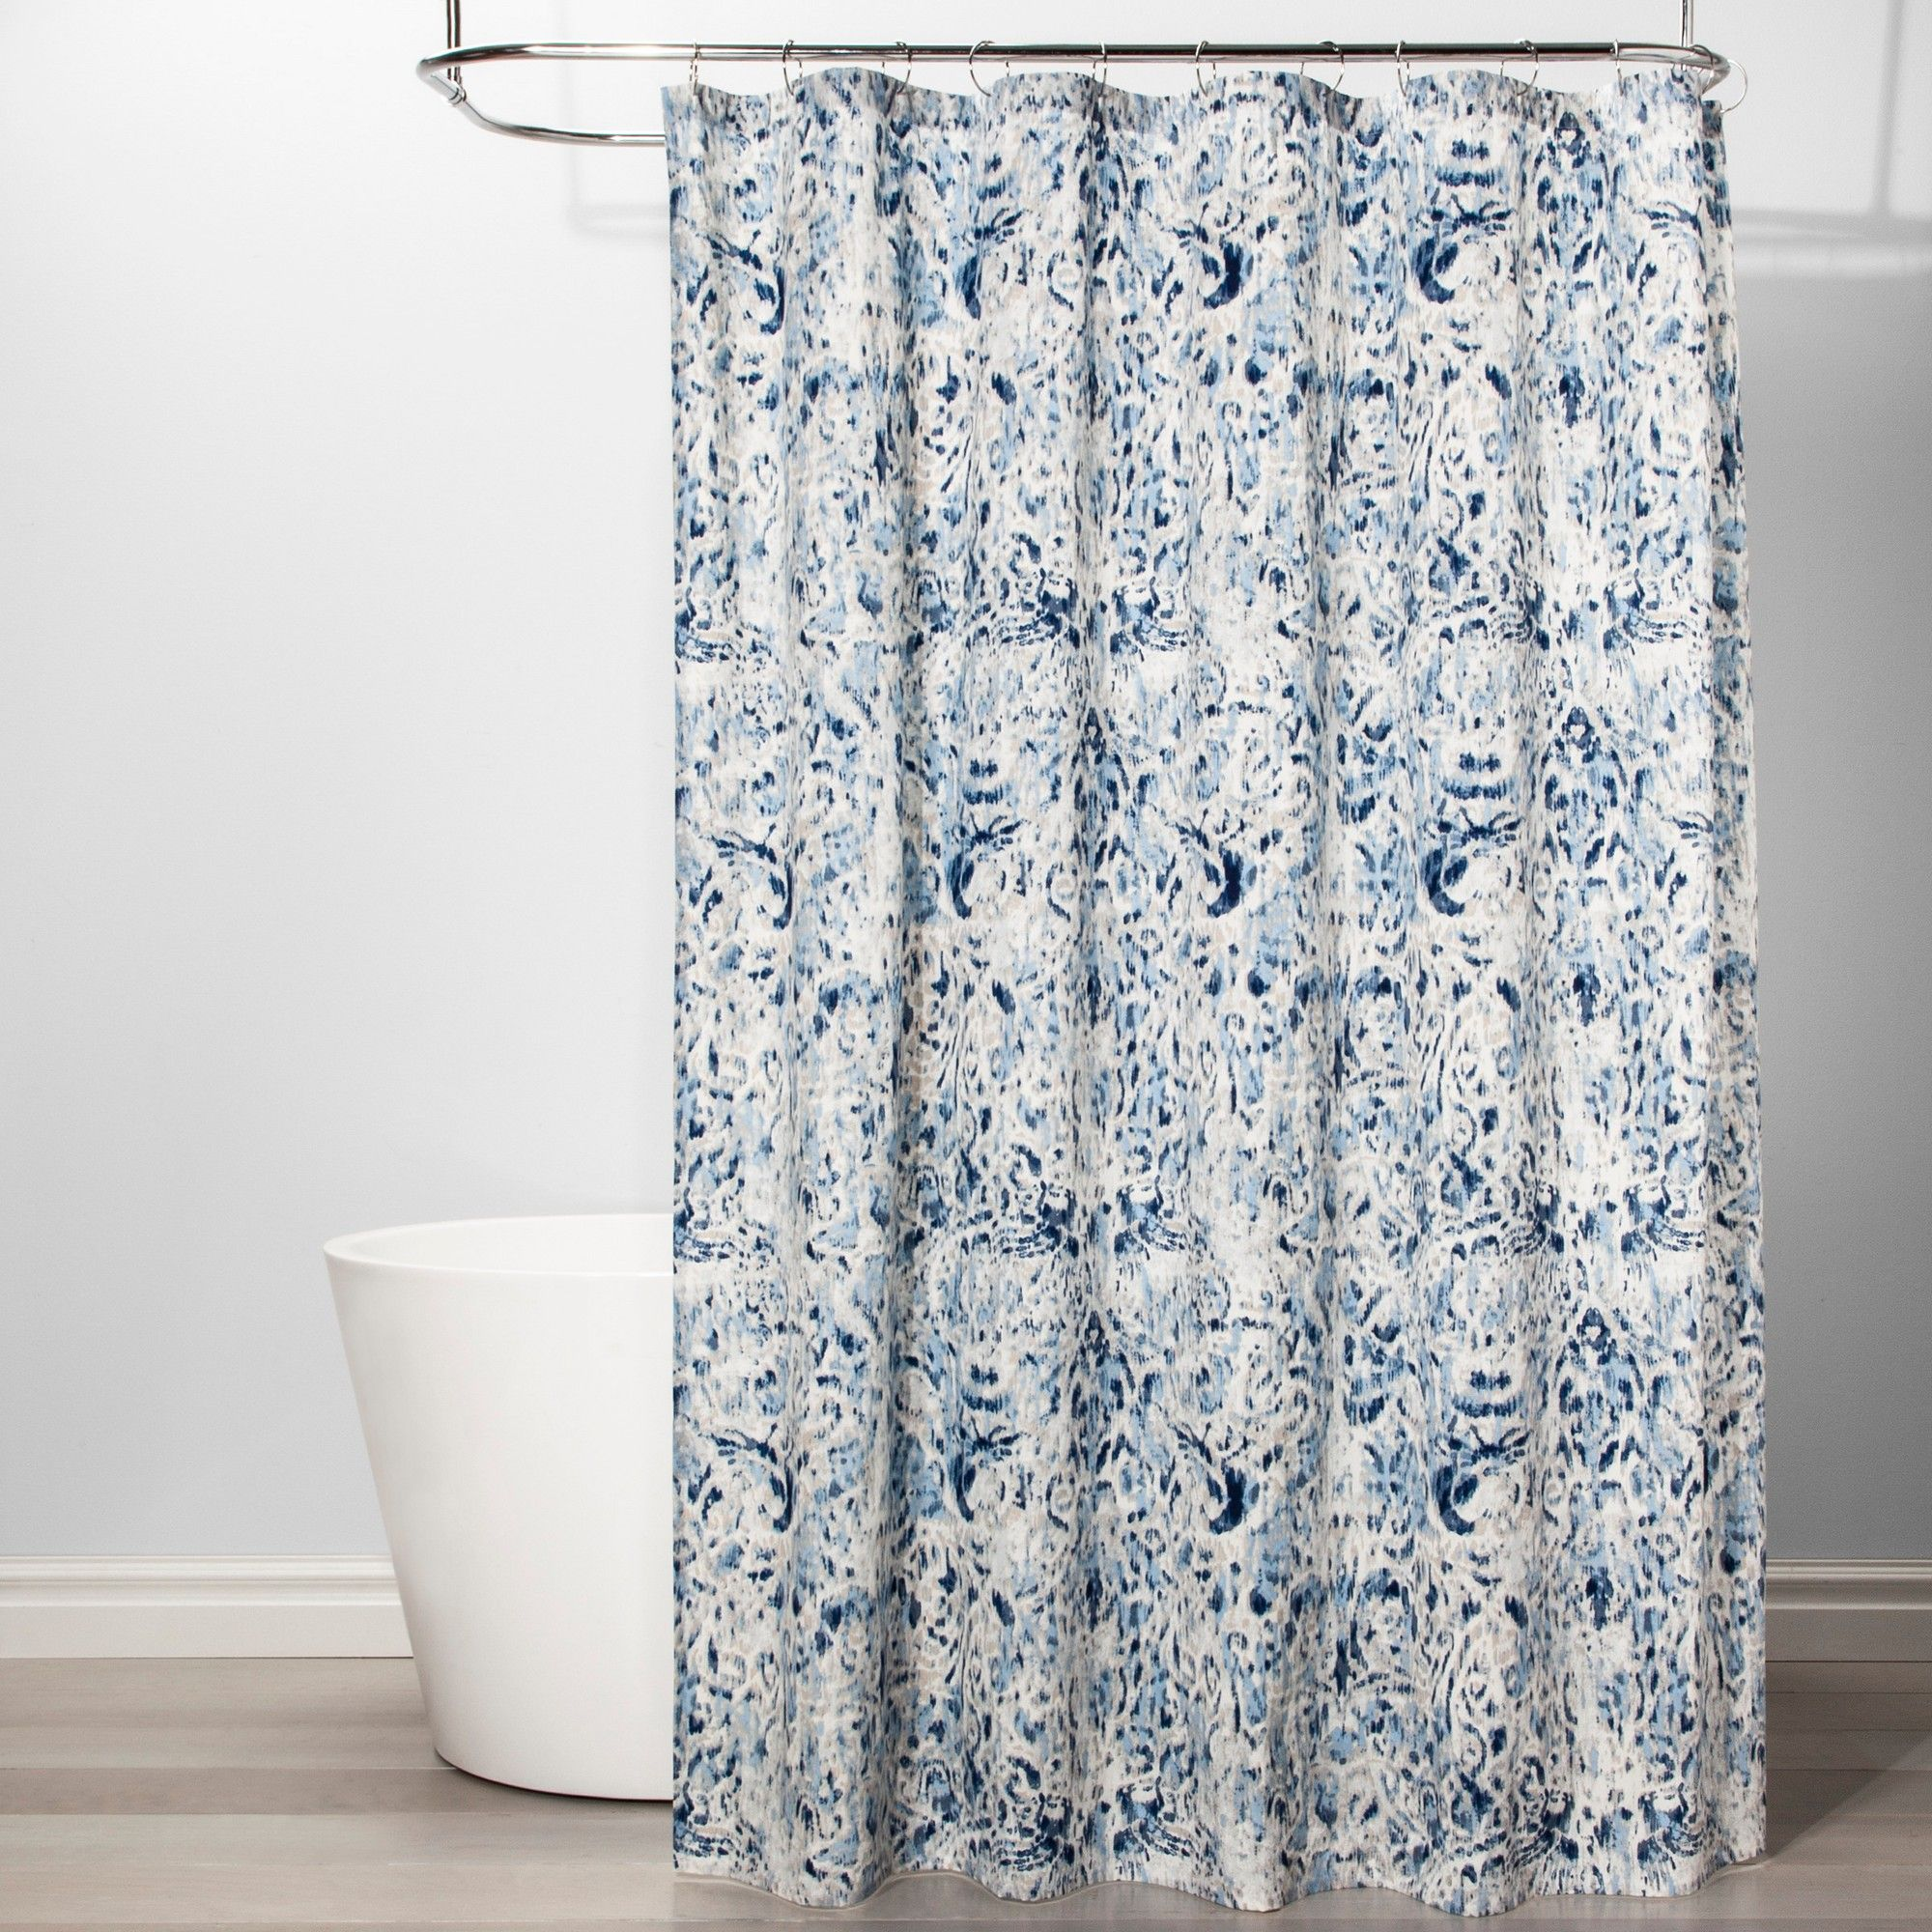 Ikat Design Shower Curtain Borage Blue Threshold Black Shower